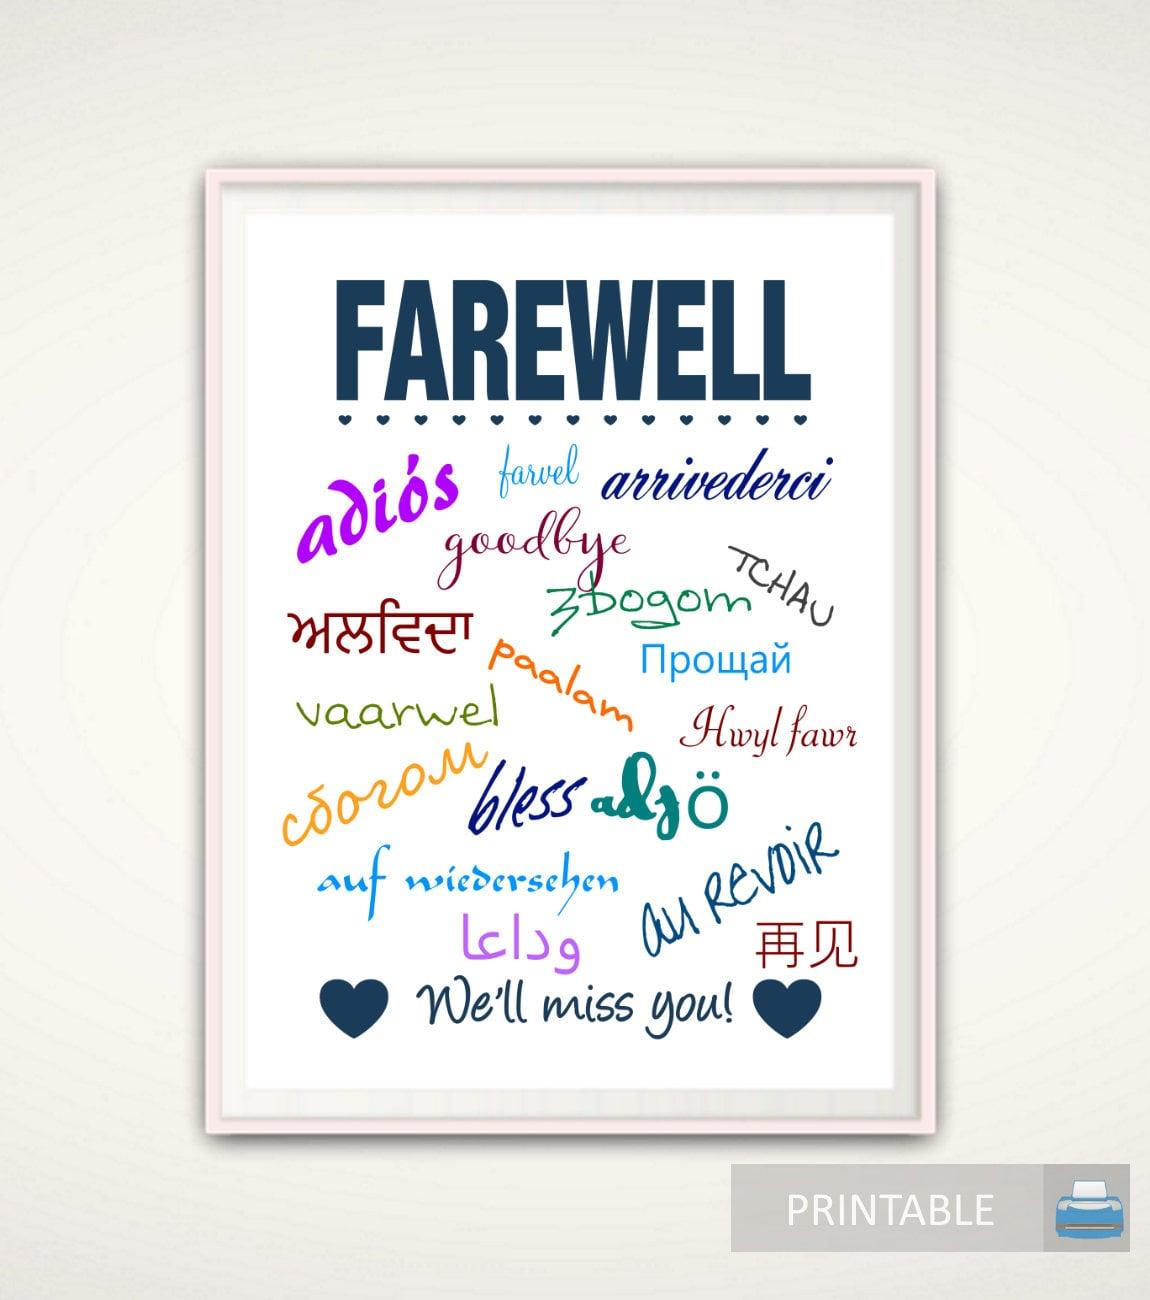 Goodbye gift going away gift goodbye print farewell print zoom monicamarmolfo Image collections